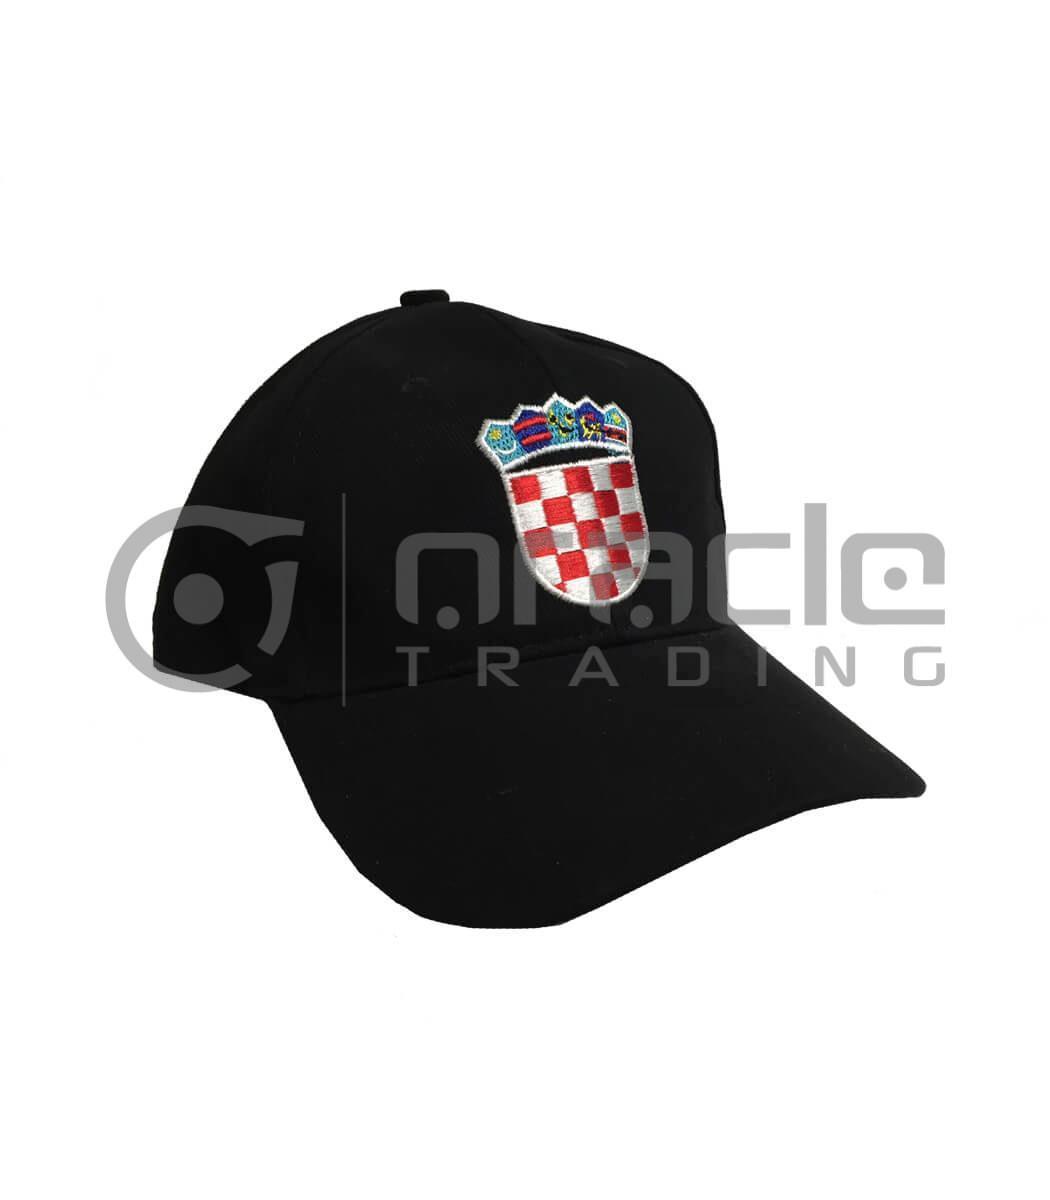 Croatia Vintage Hat